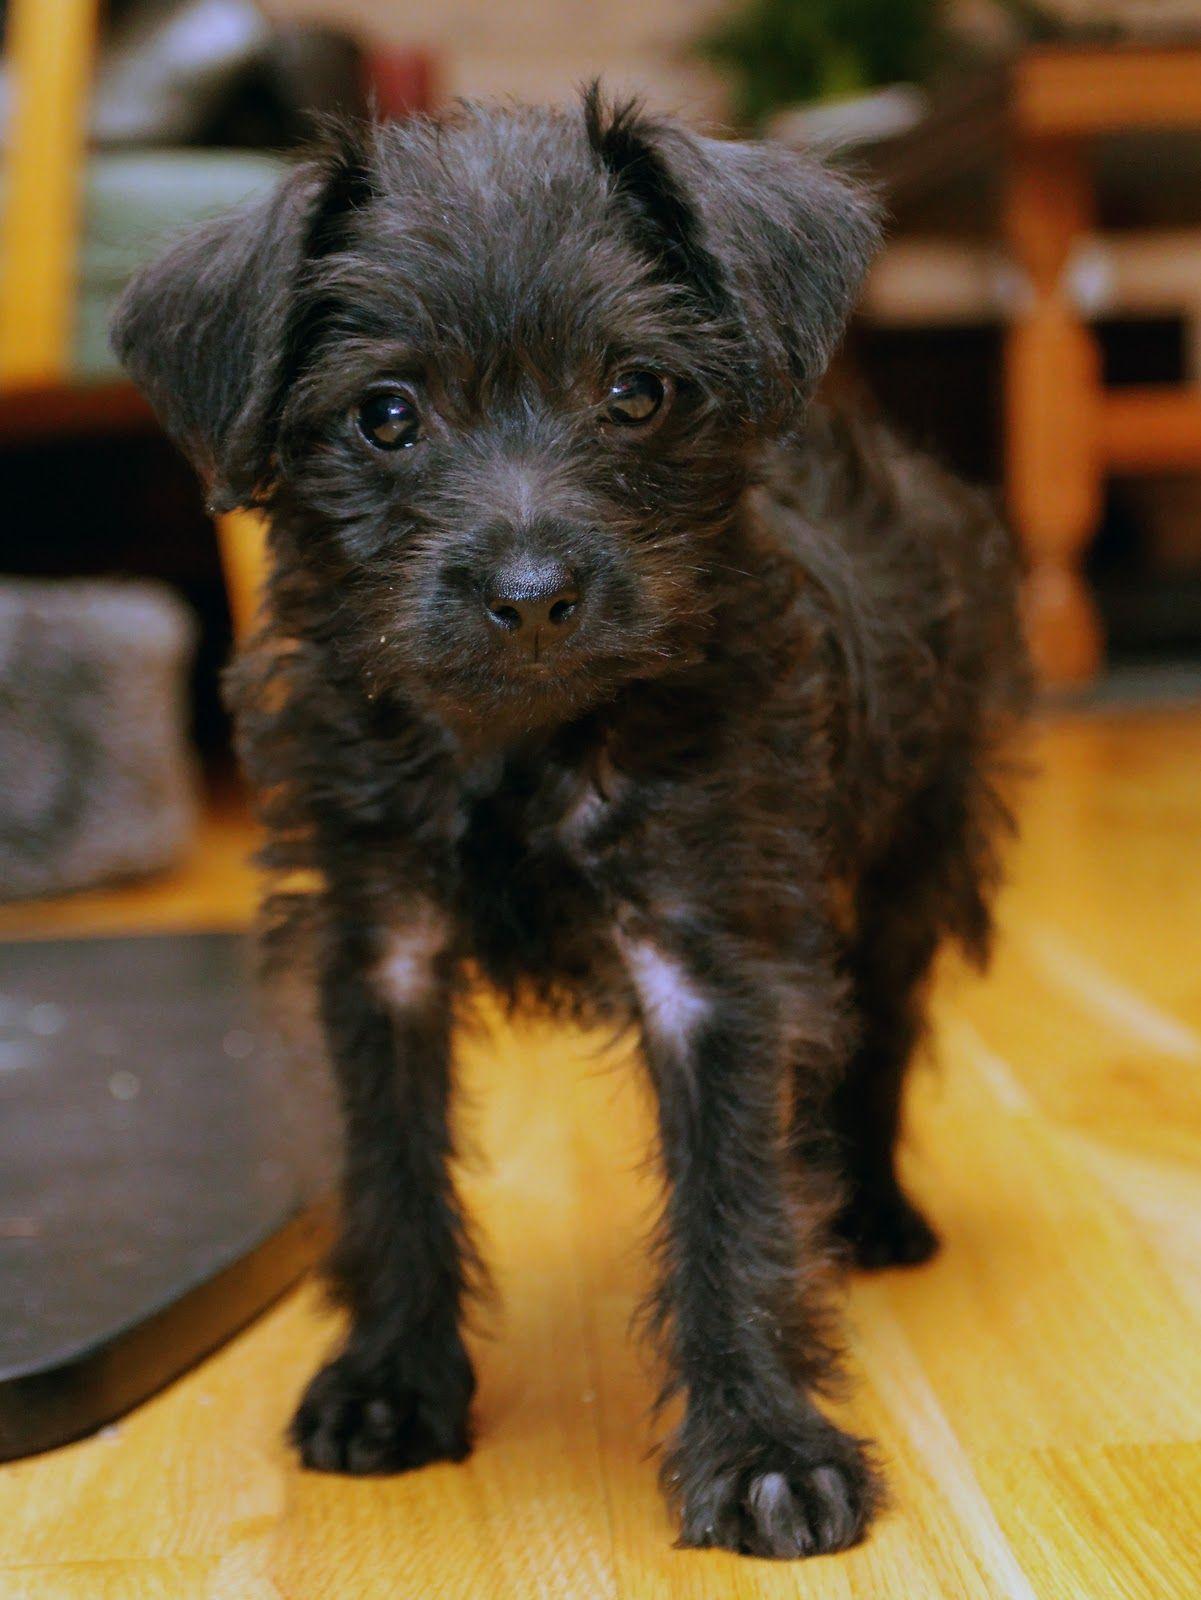 Miniature Pinscher Miniature Poodle Mix Puppy Lynvingen Photos